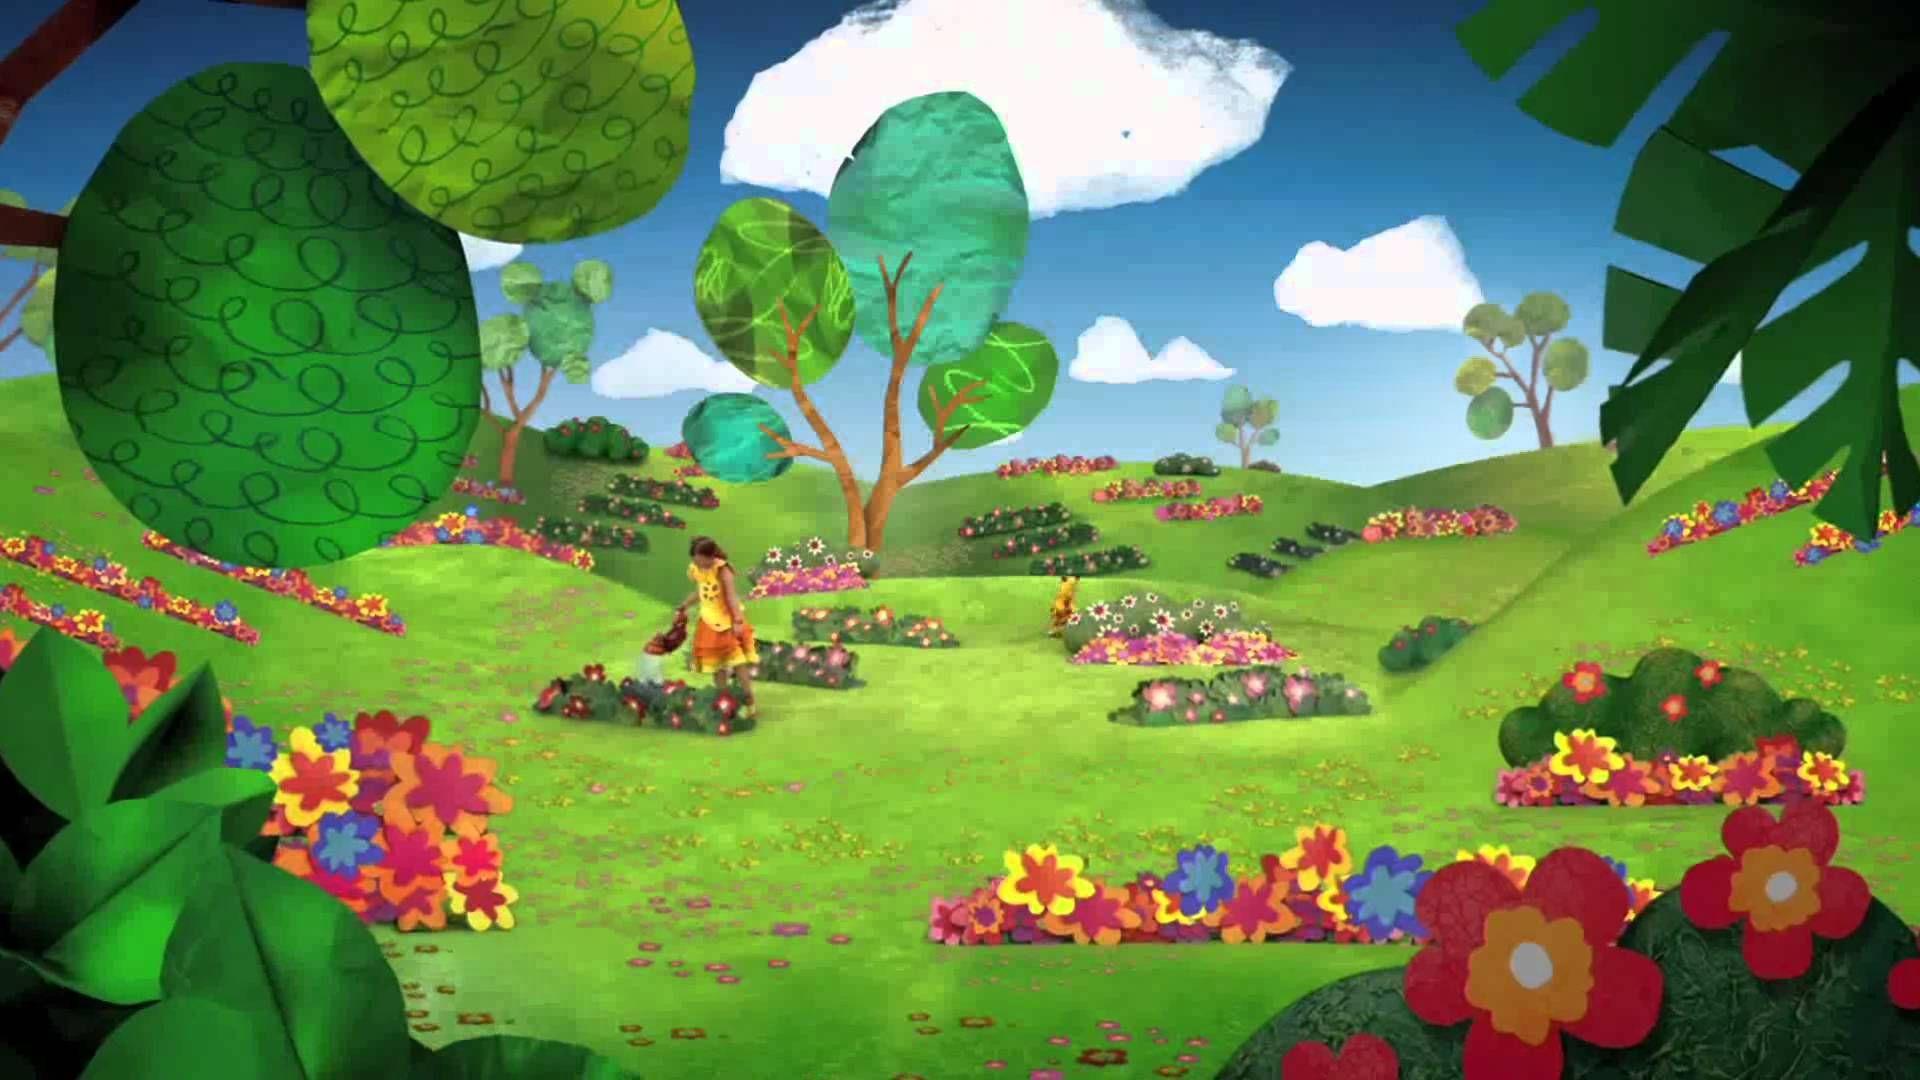 Jardin con flores dibujo cerca amb google anna 15 16 - Jardines con rosas ...